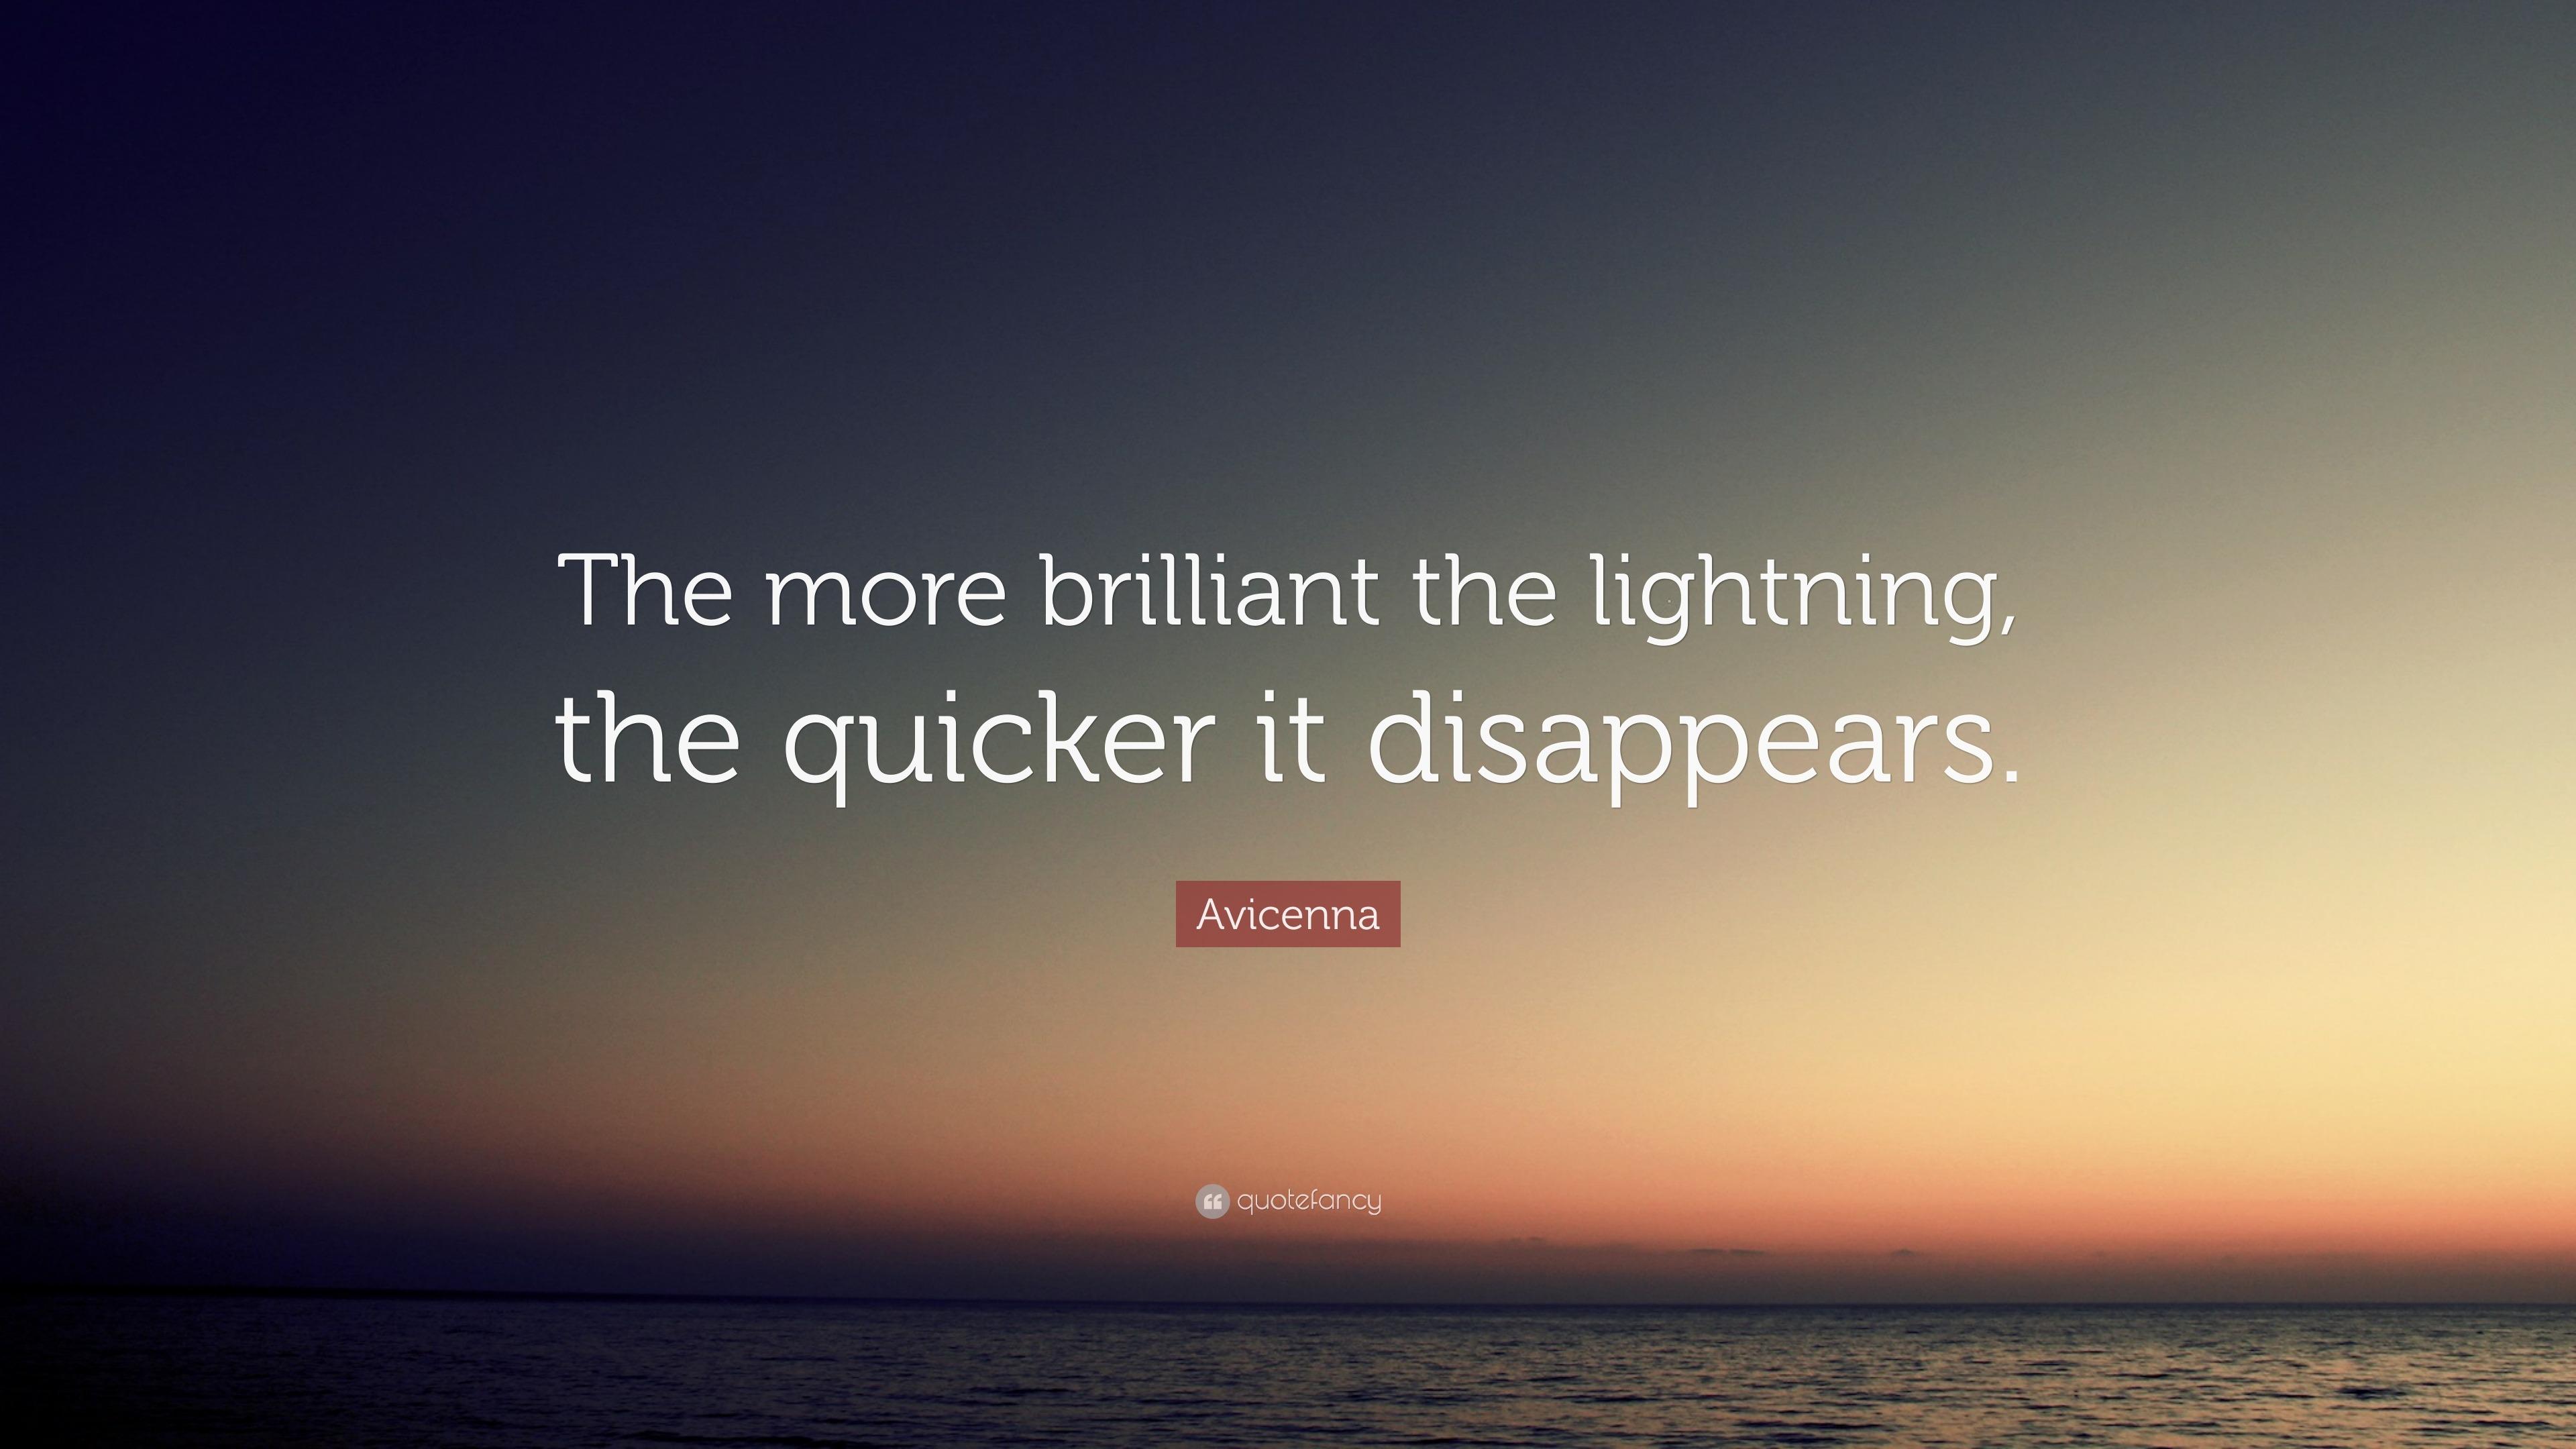 Avicenna Quotes